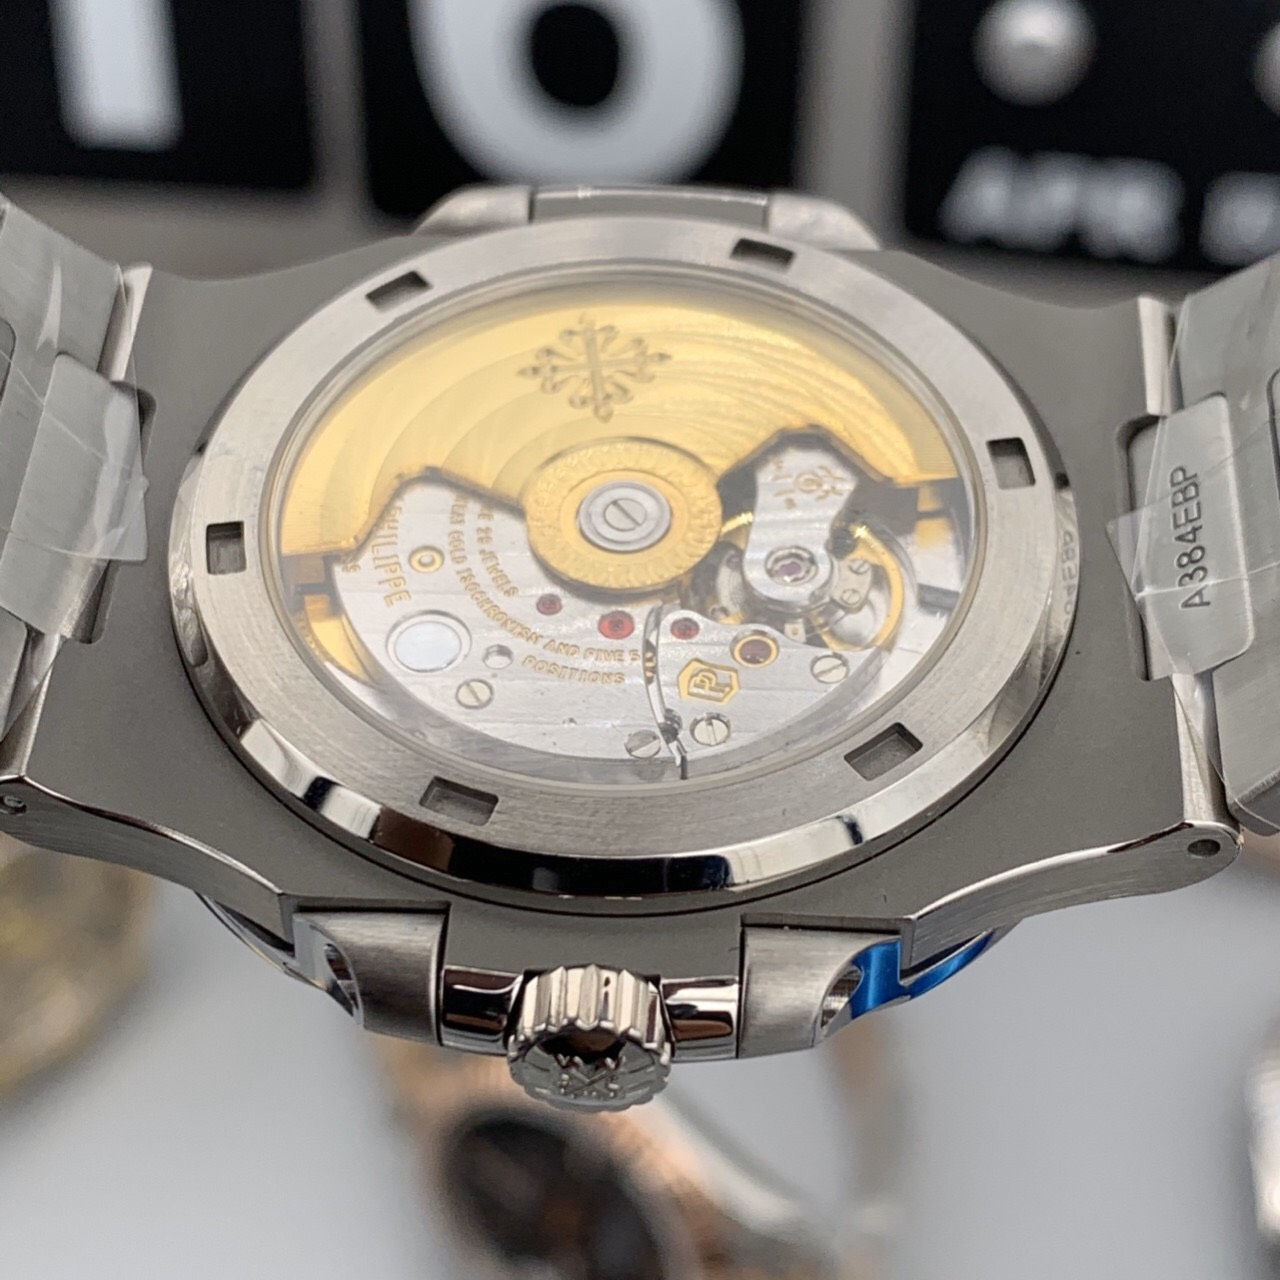 đồng hồ patek philippe geneve fake